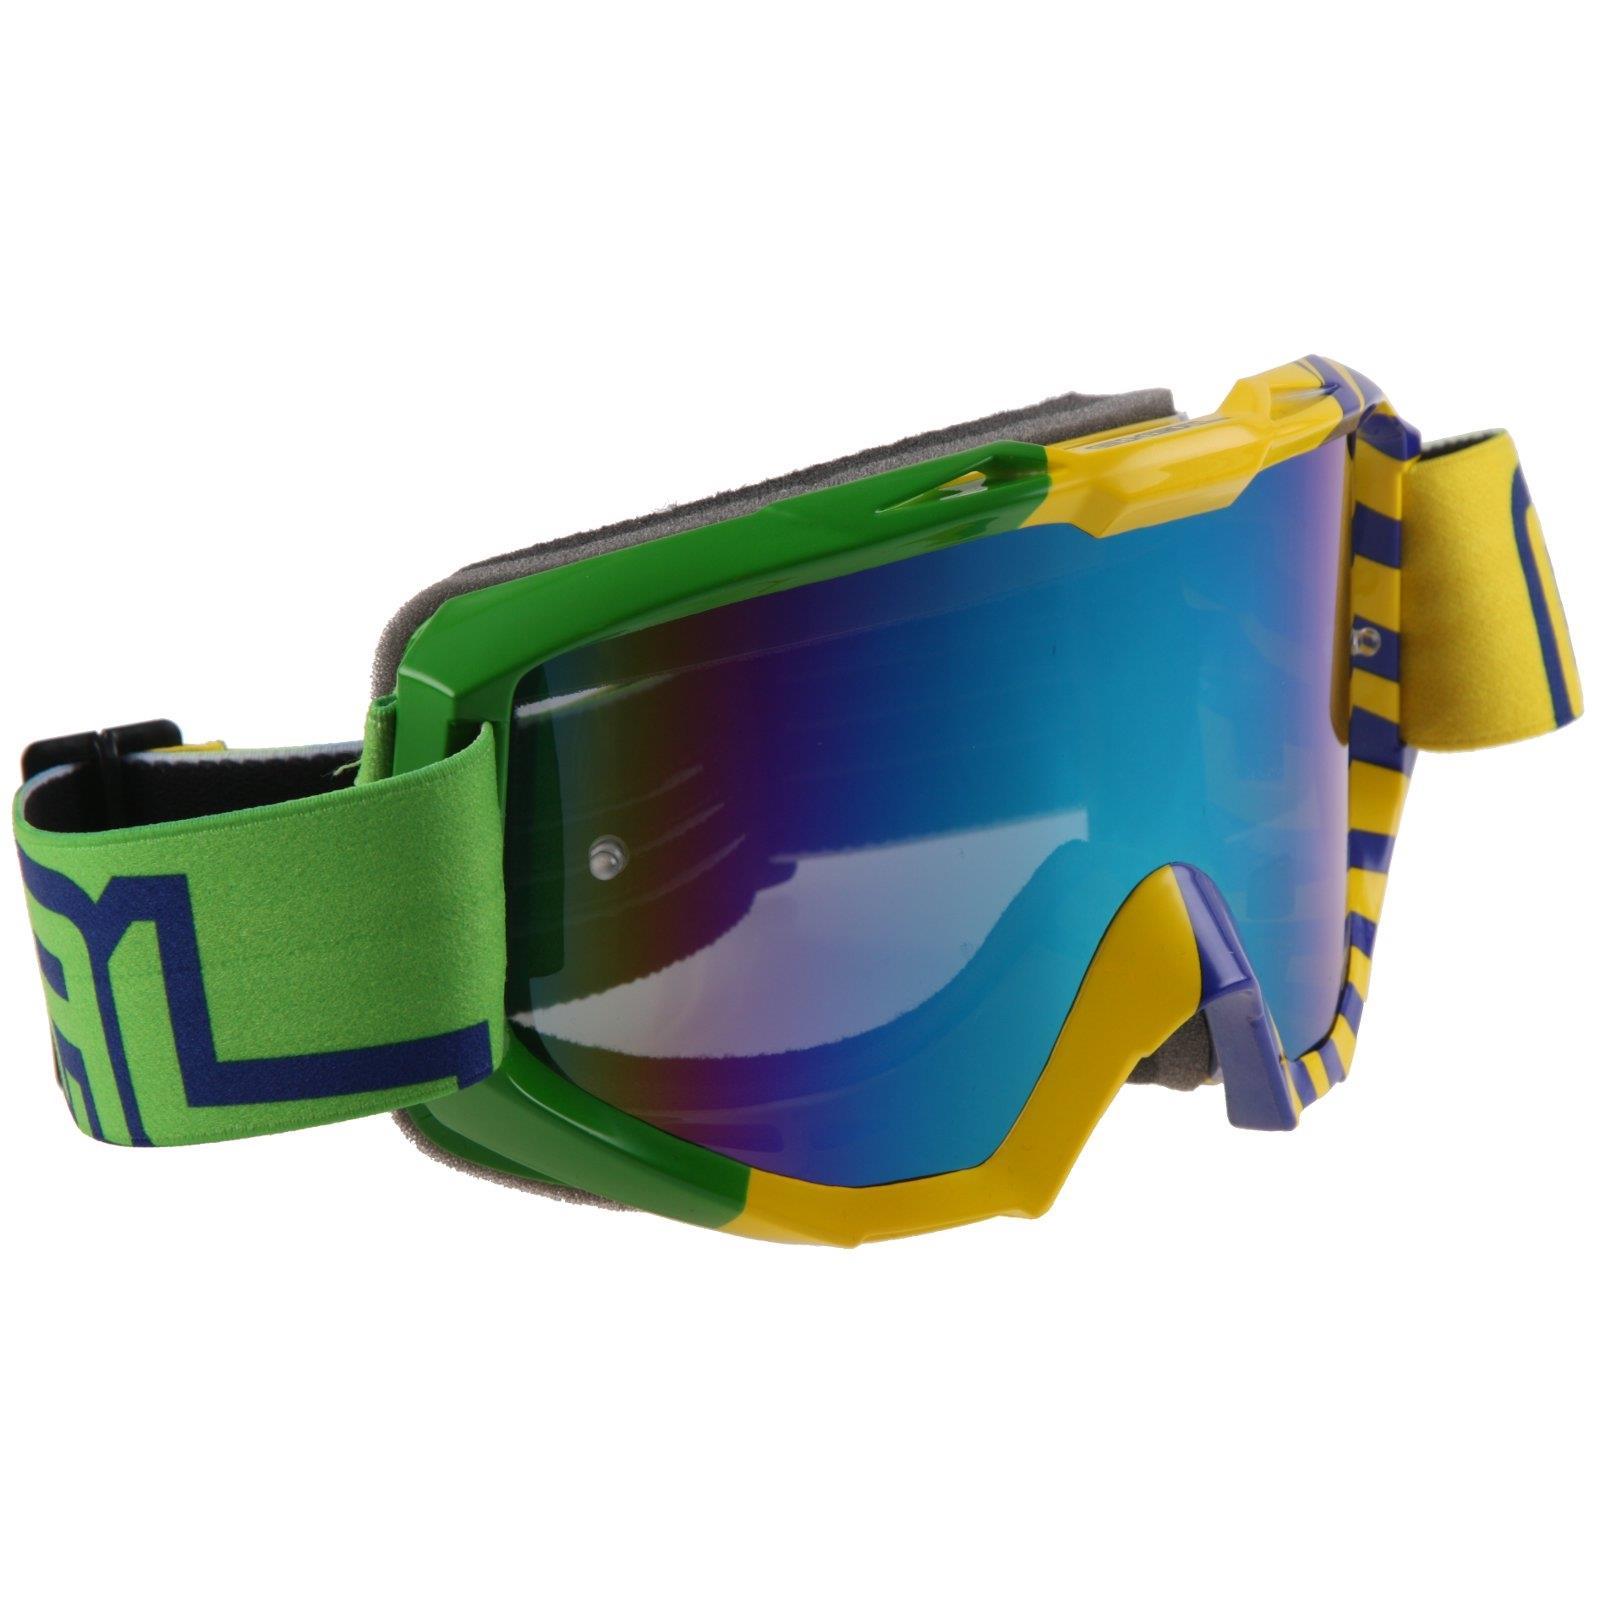 O-039-Neal-b1-Radium-MX-Goggle-Motocross-Occhiali-a-specchio-cross-enduro-dh-downhill miniatura 11